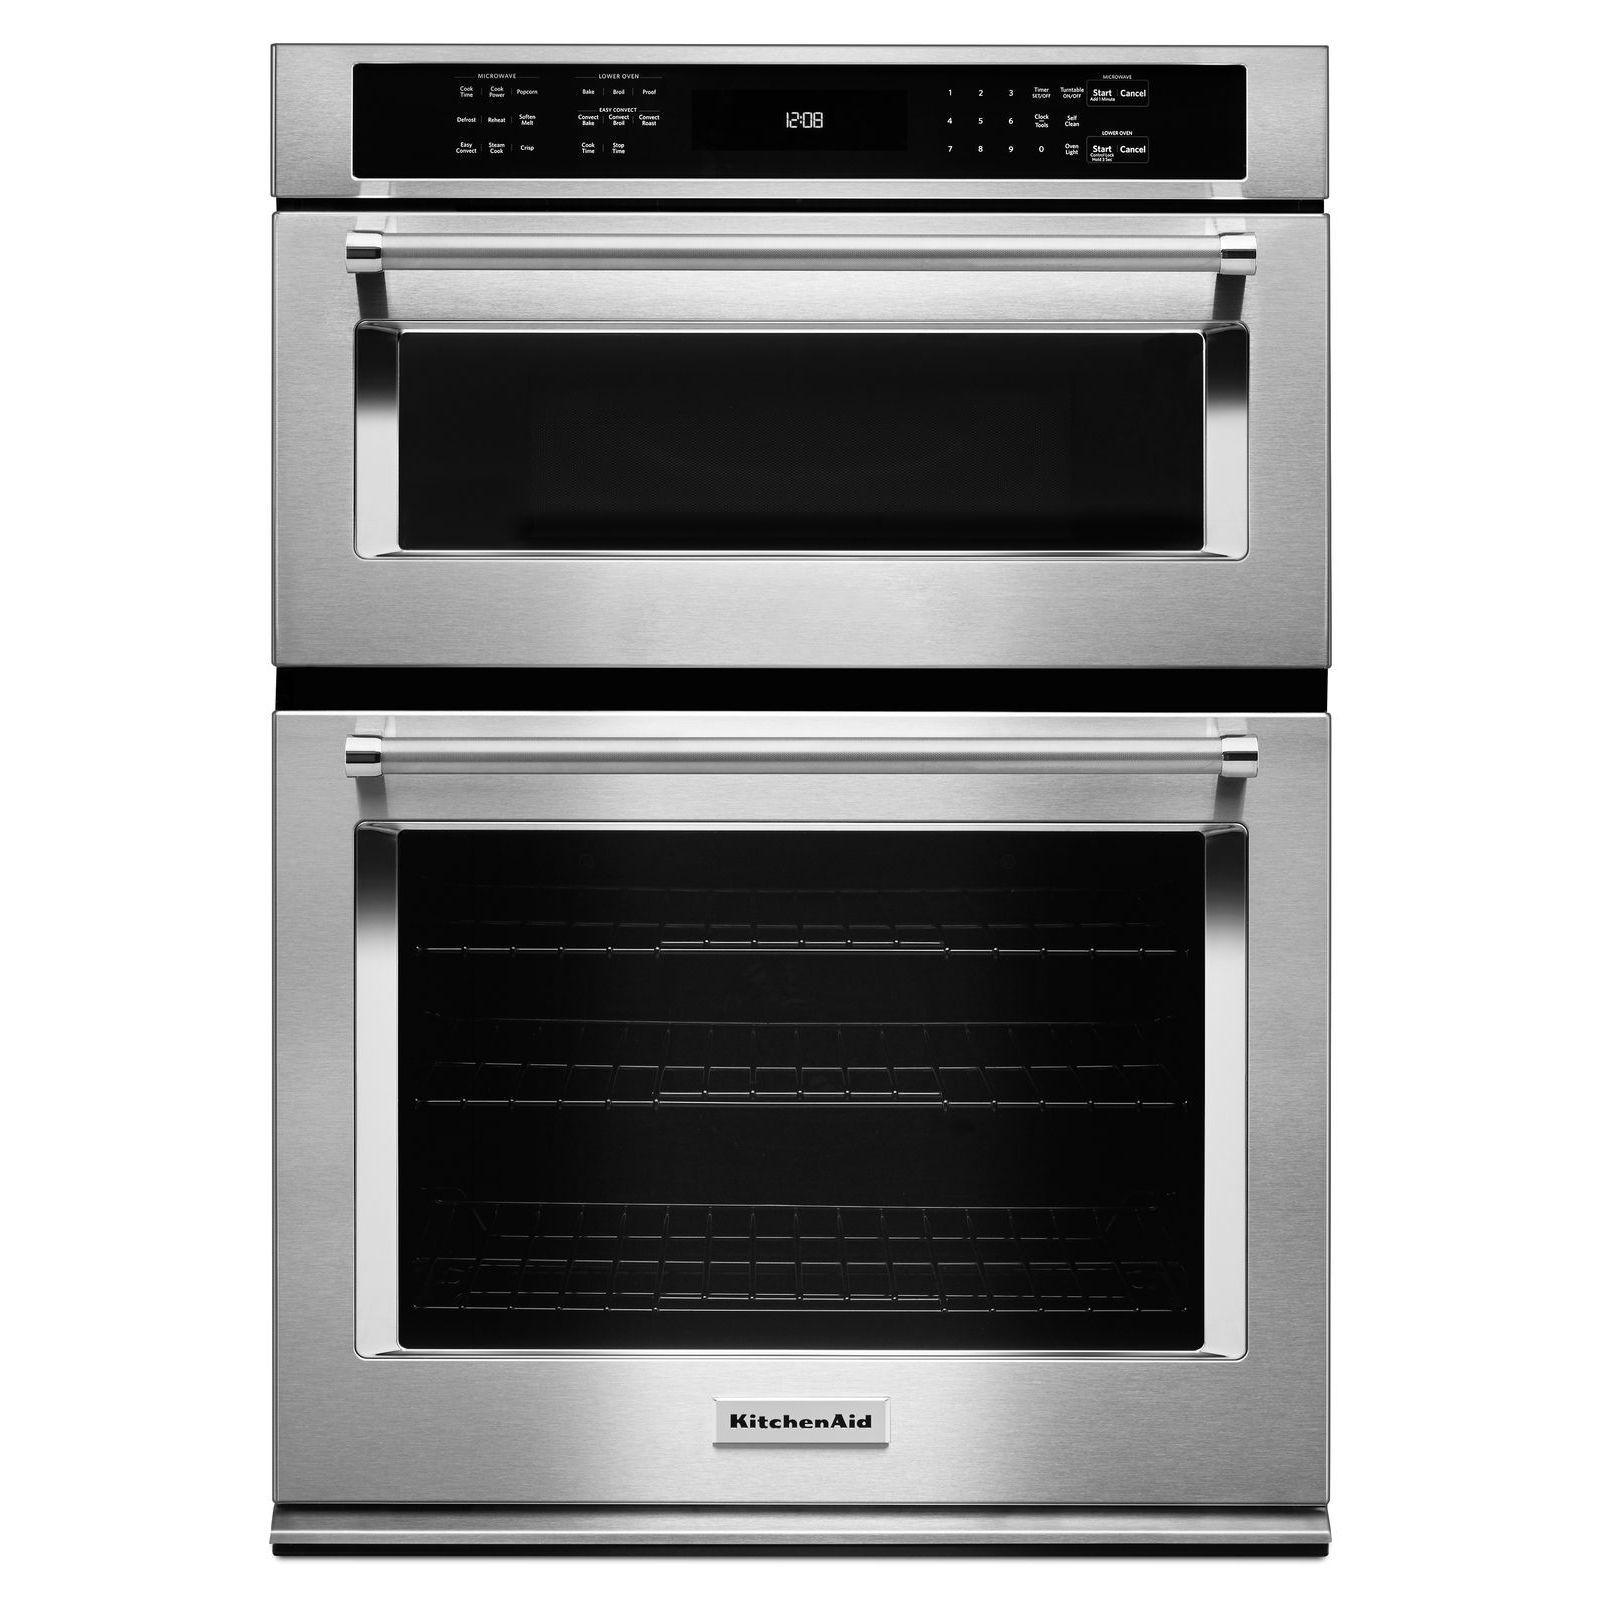 Koce500ess 2663 kitchenaid 30 combination wall oven